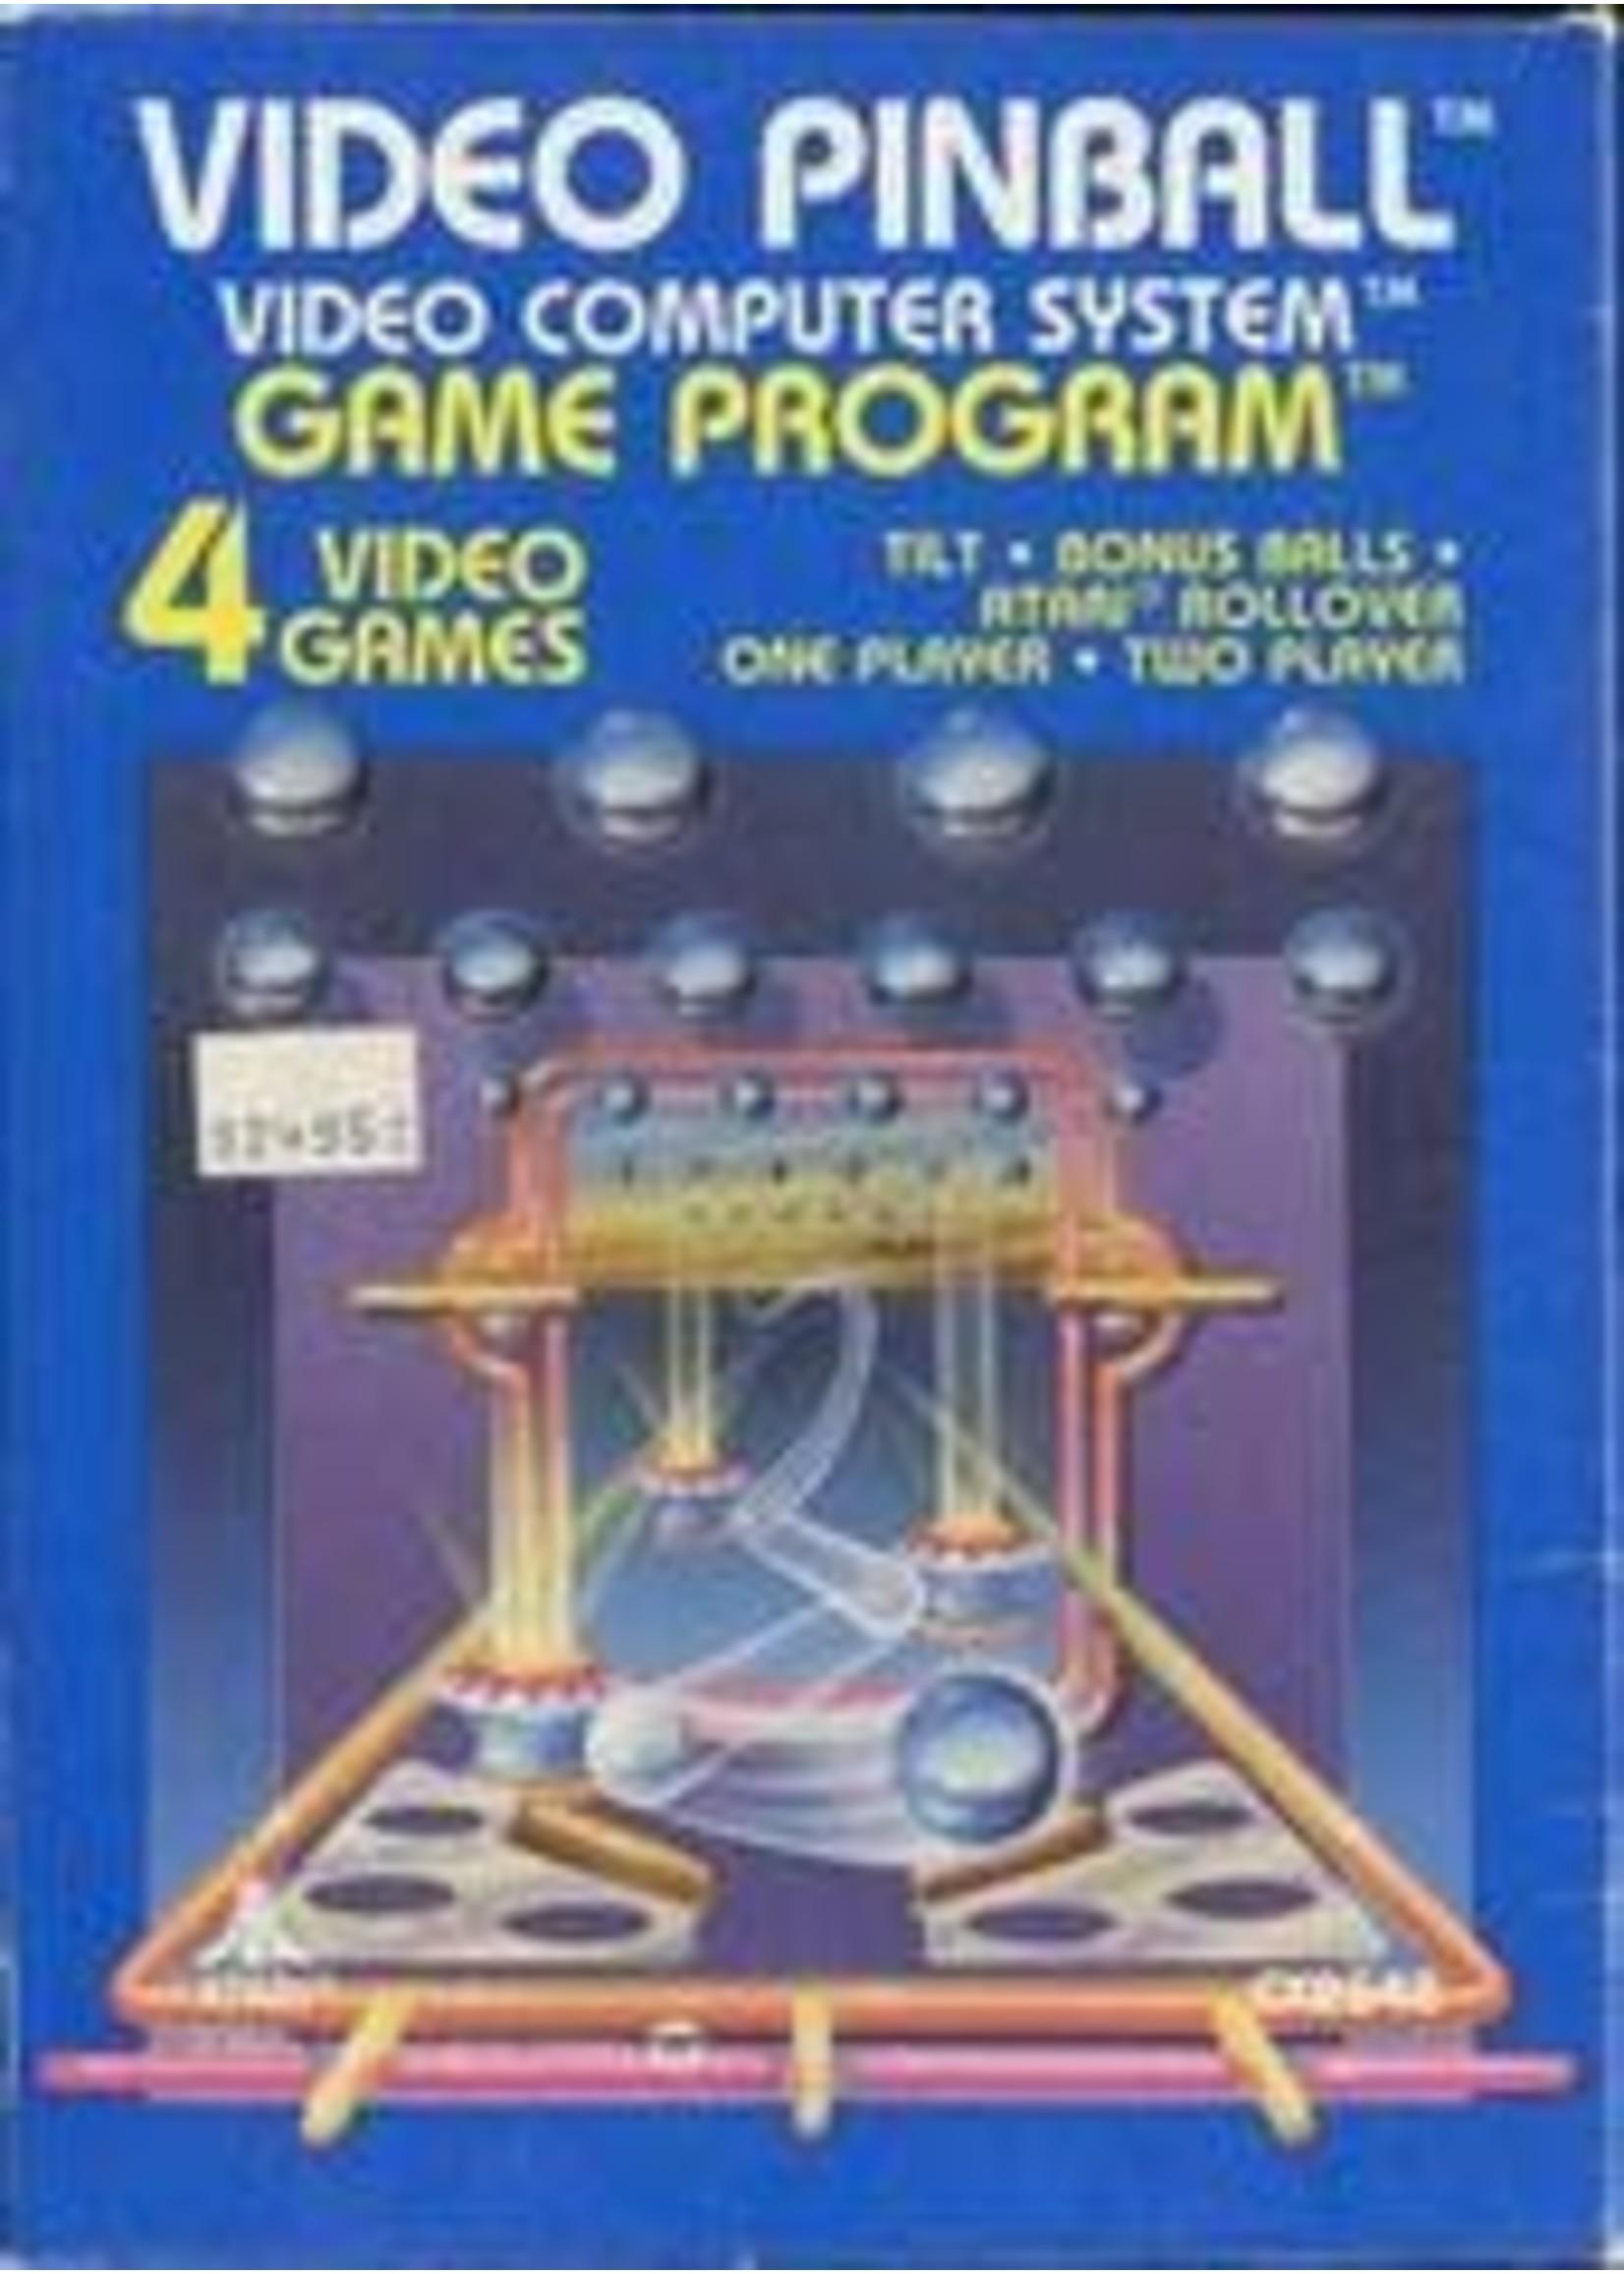 Video Pinball Atari 2600